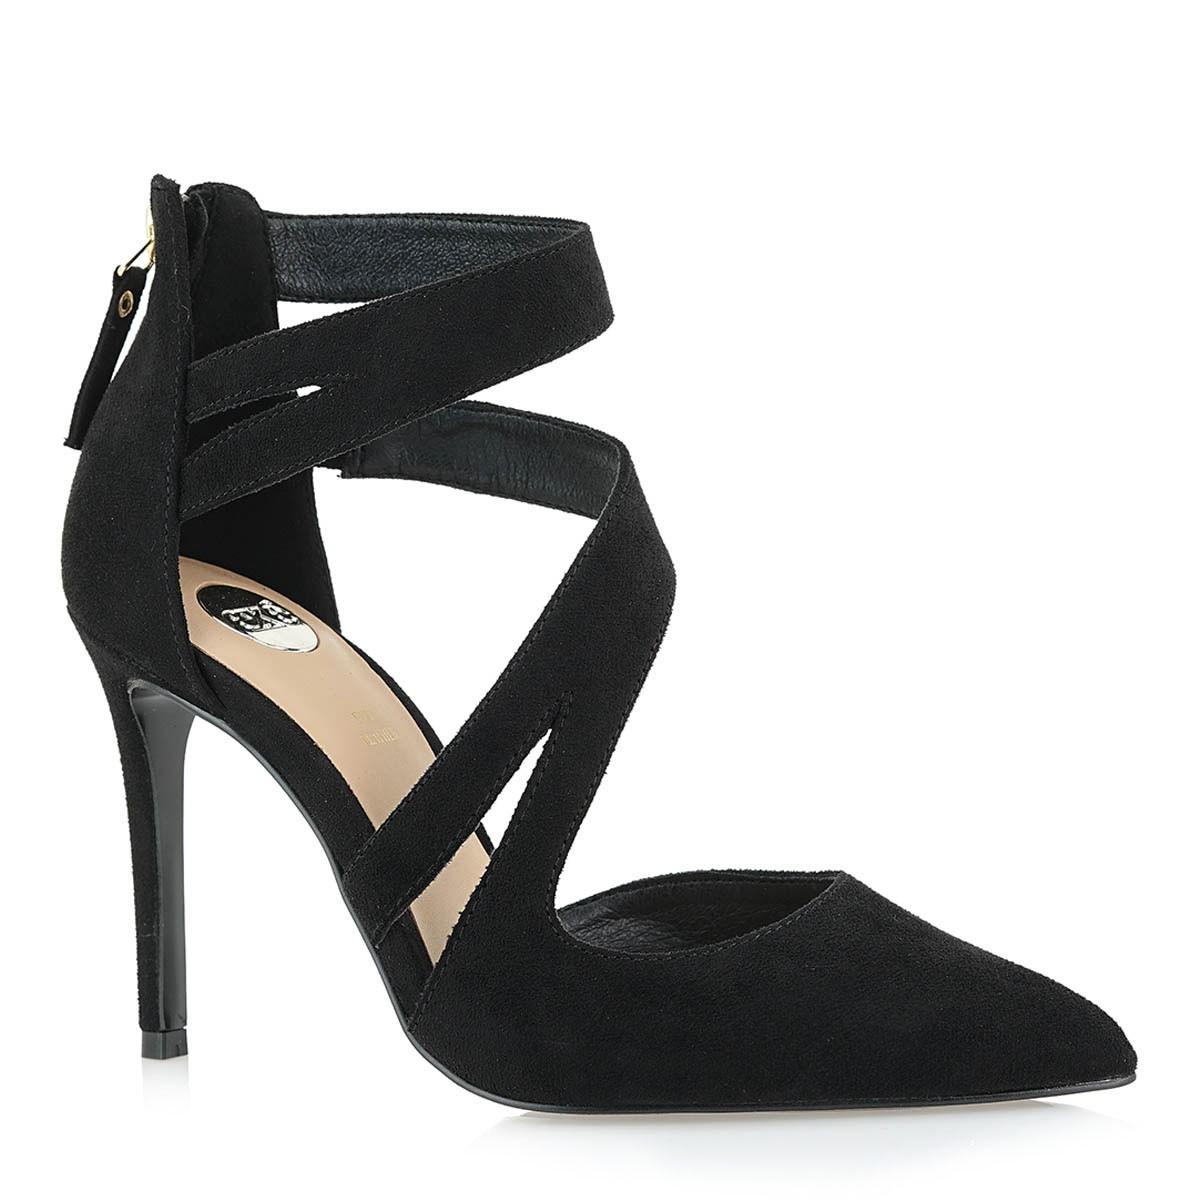 Exe Shoes Γυναικείες Γόβες 283-JESSICA-382 Μαύρο Καστόρι J17002835004